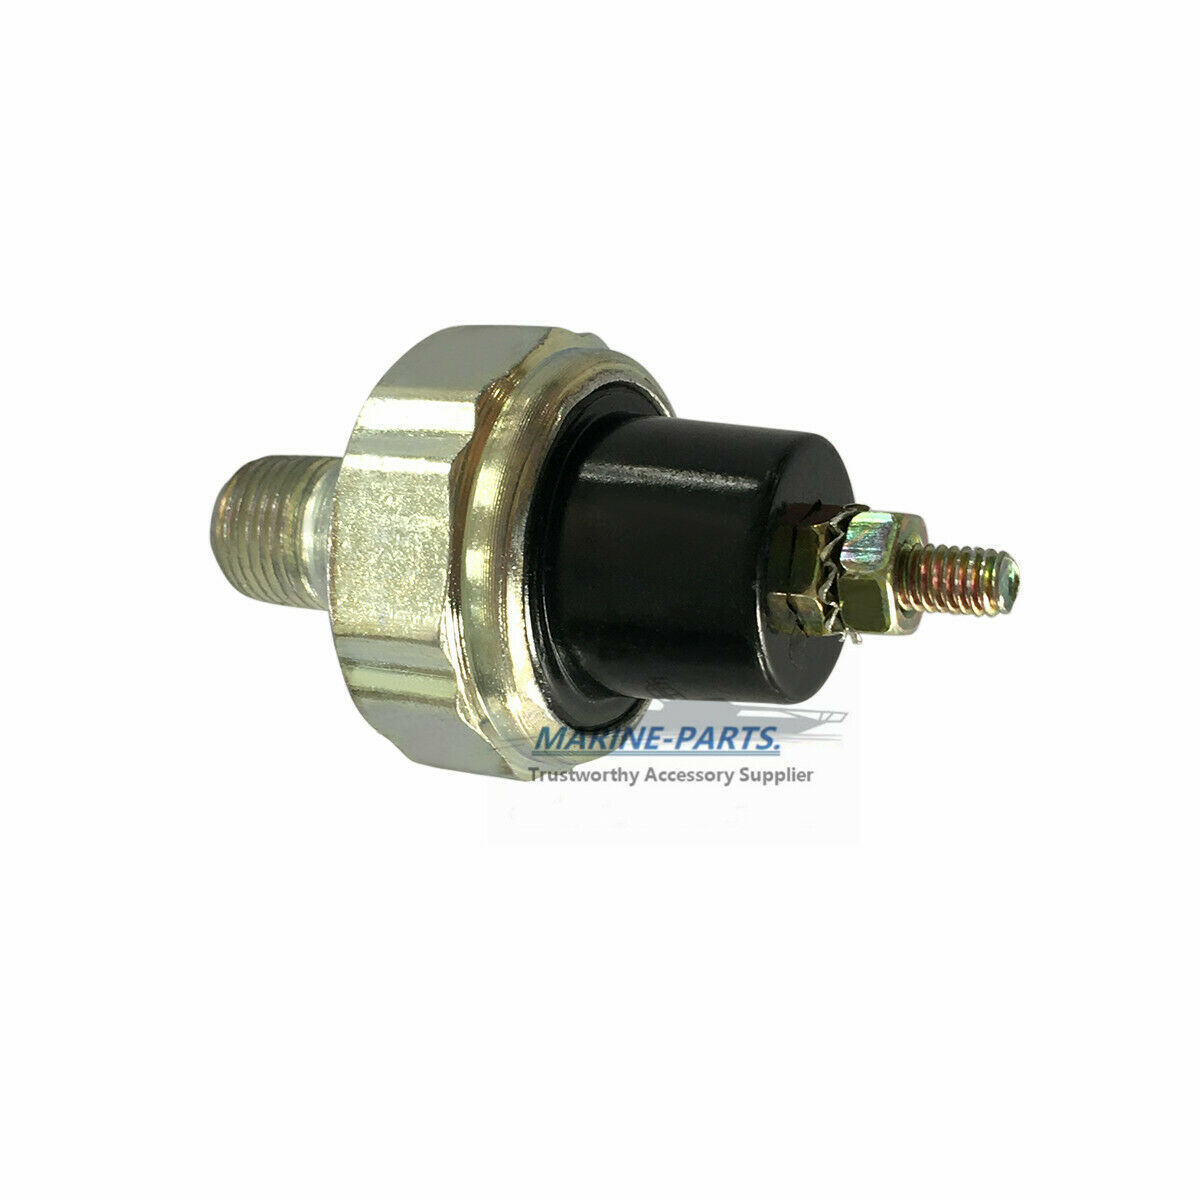 87-805605A1 OMC Marine Power Oil Pressure Switch for Mercruiser Indmar Alarm